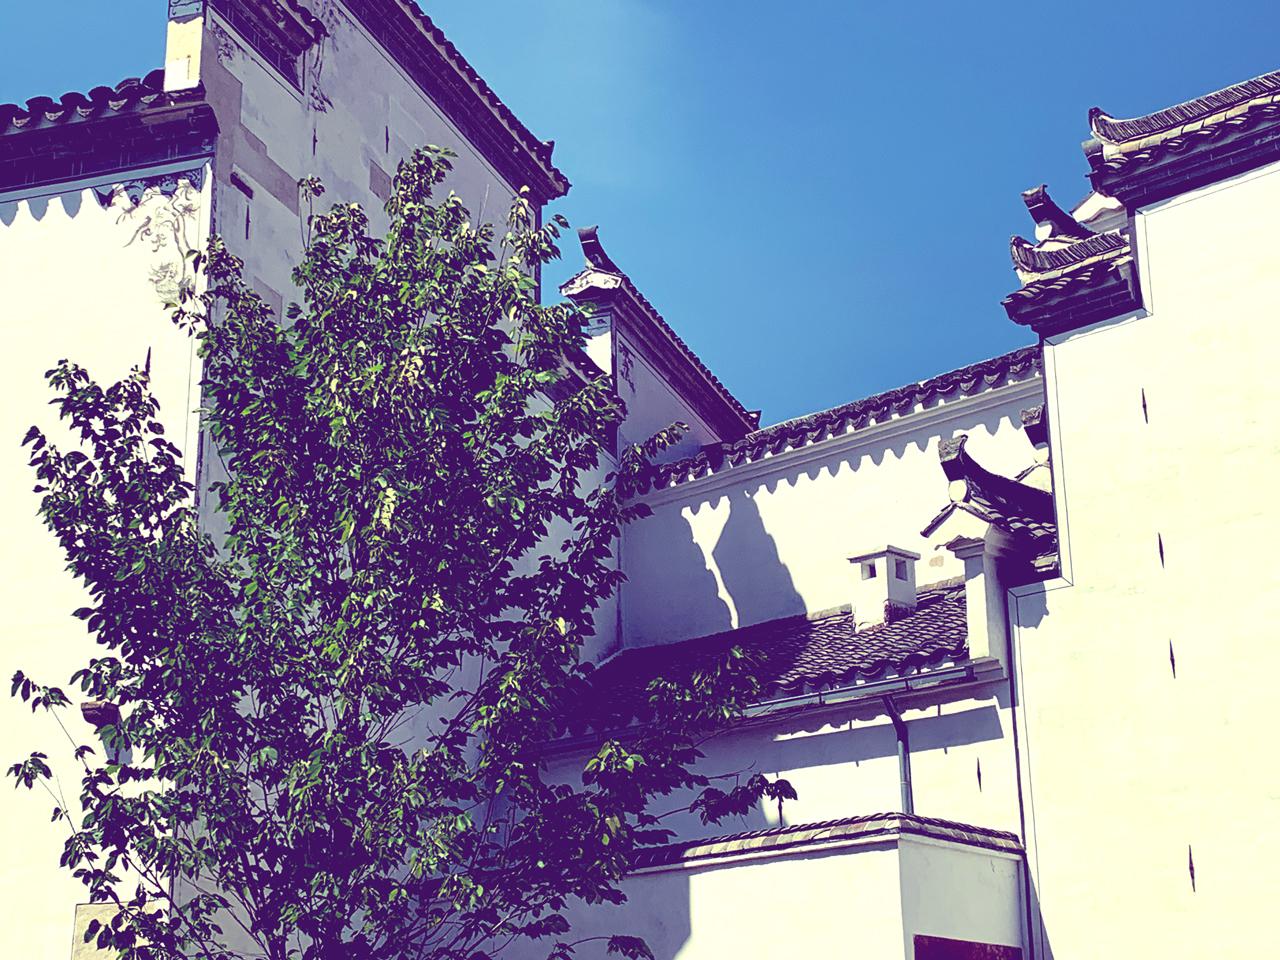 yin-yu-tang-house-peabody-essex-museum-salem-massachusetts-1280x960-03